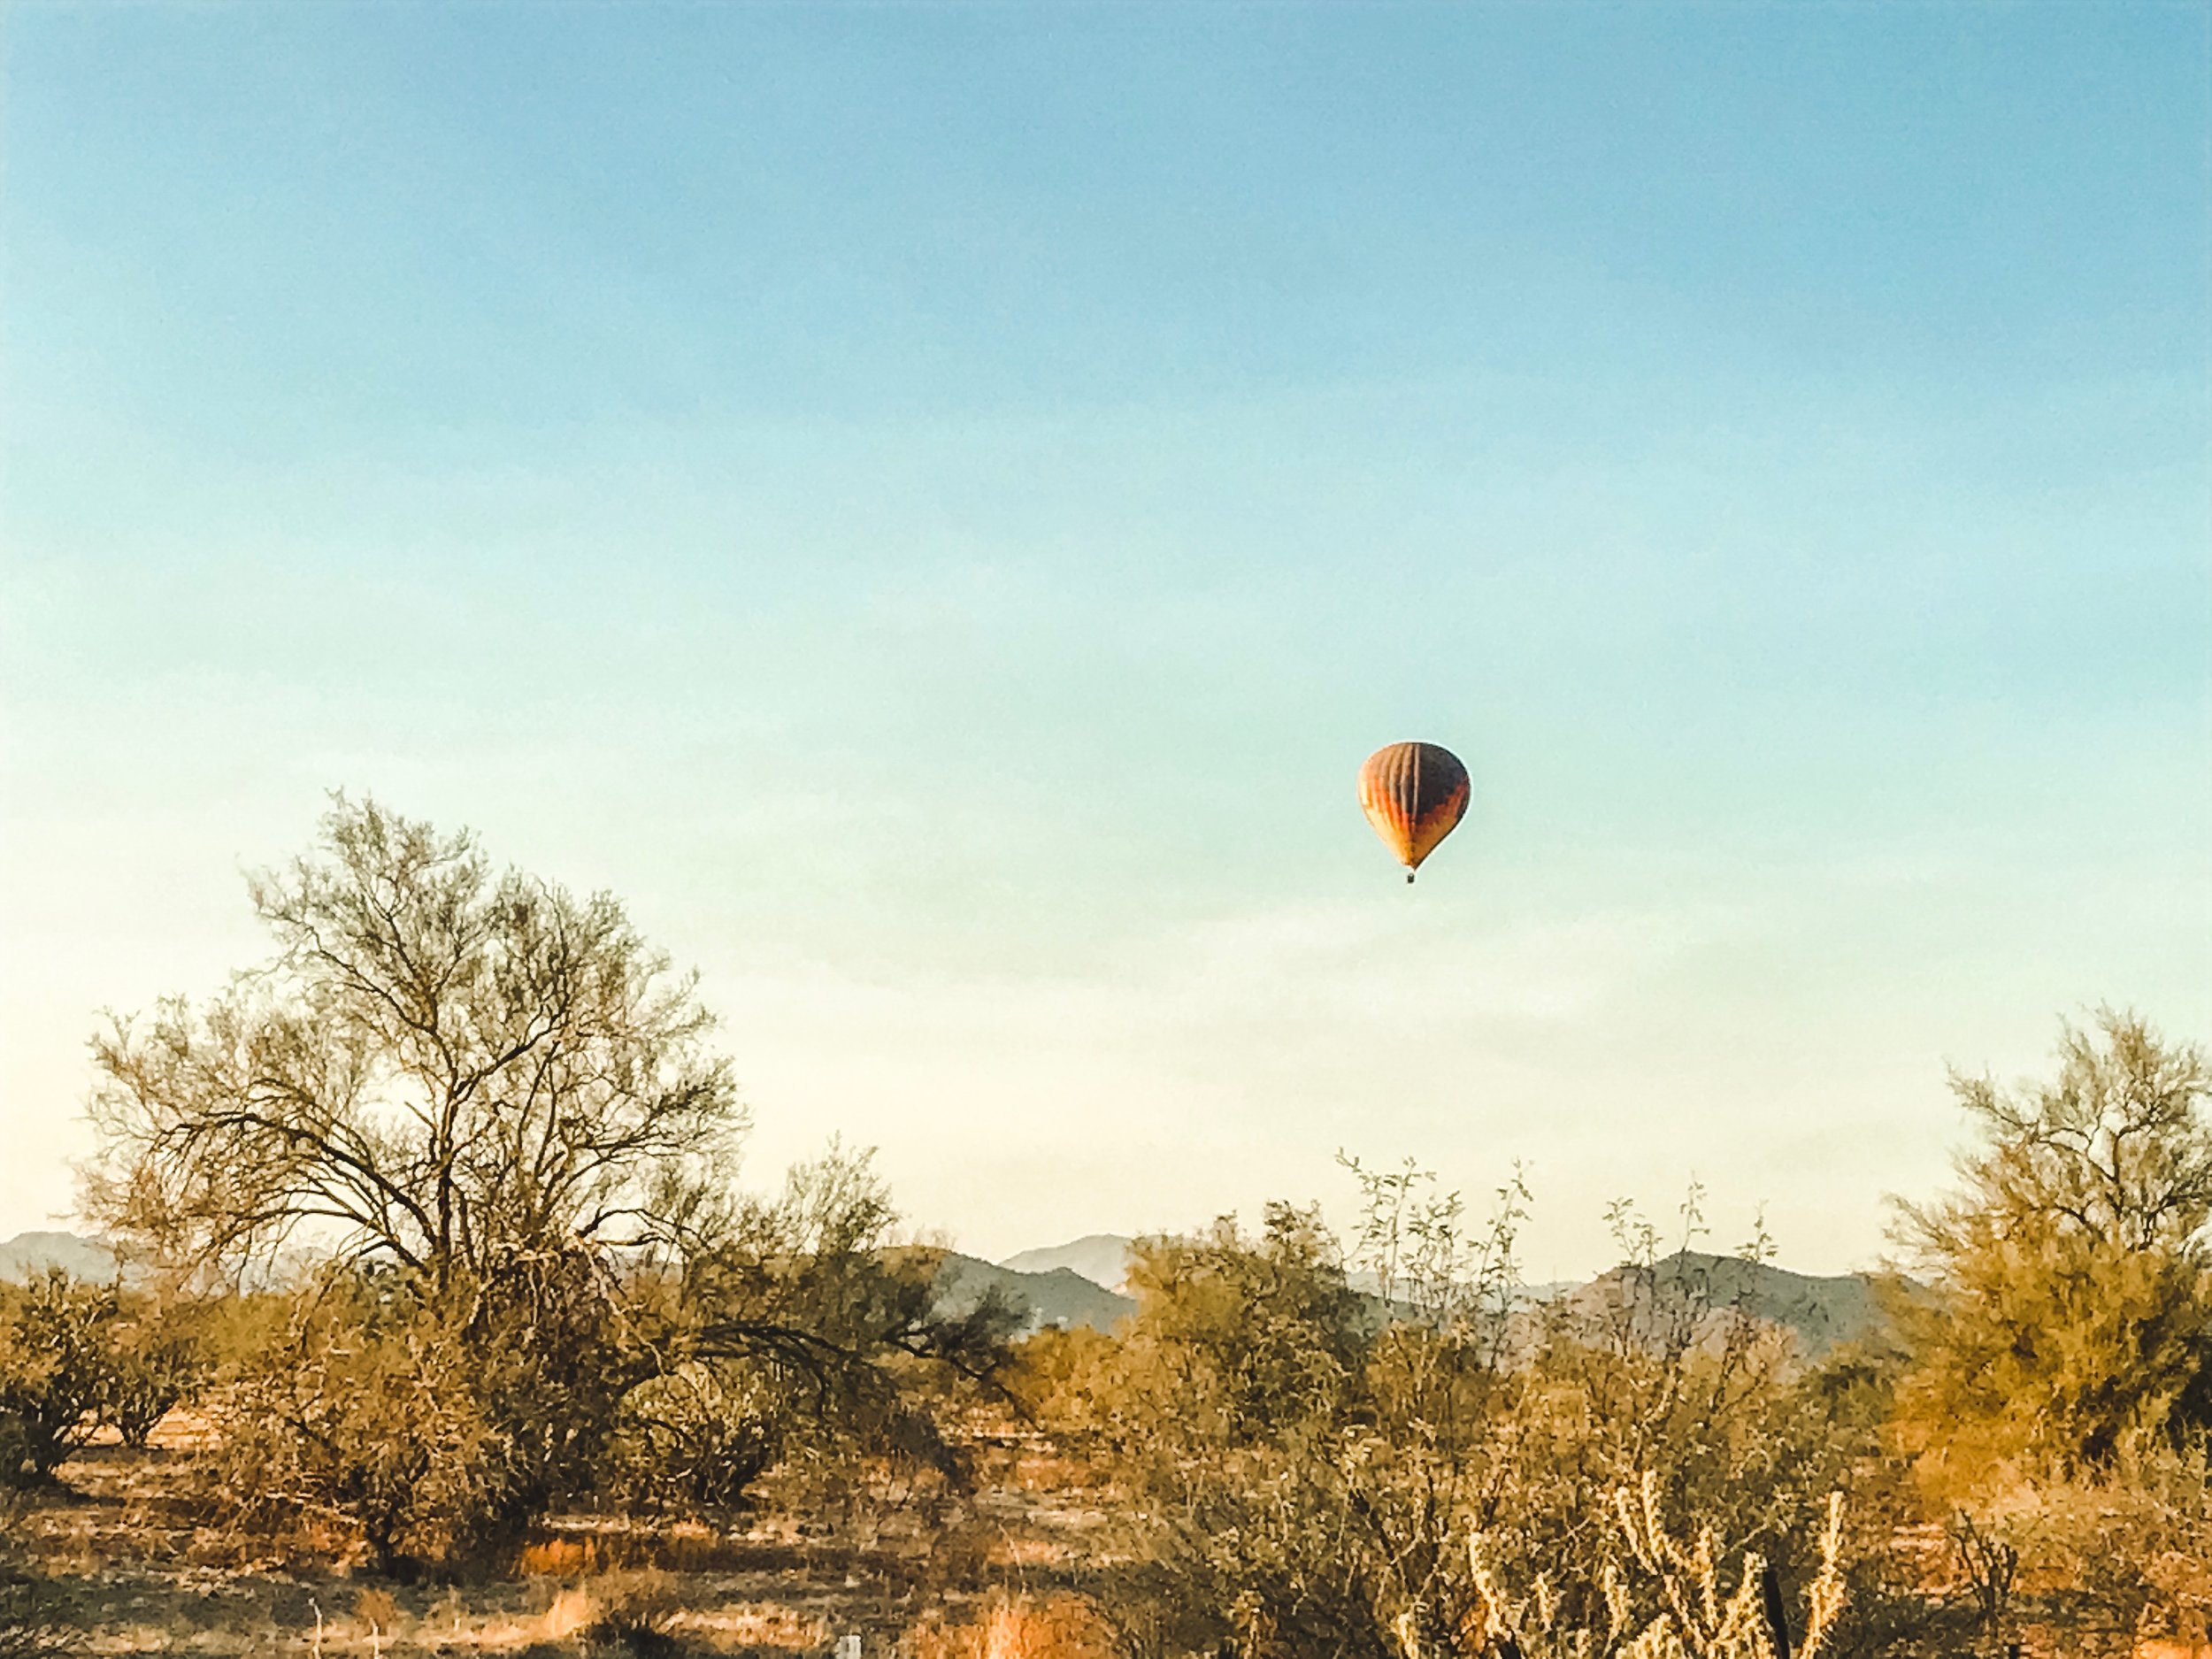 arizona5.jpg